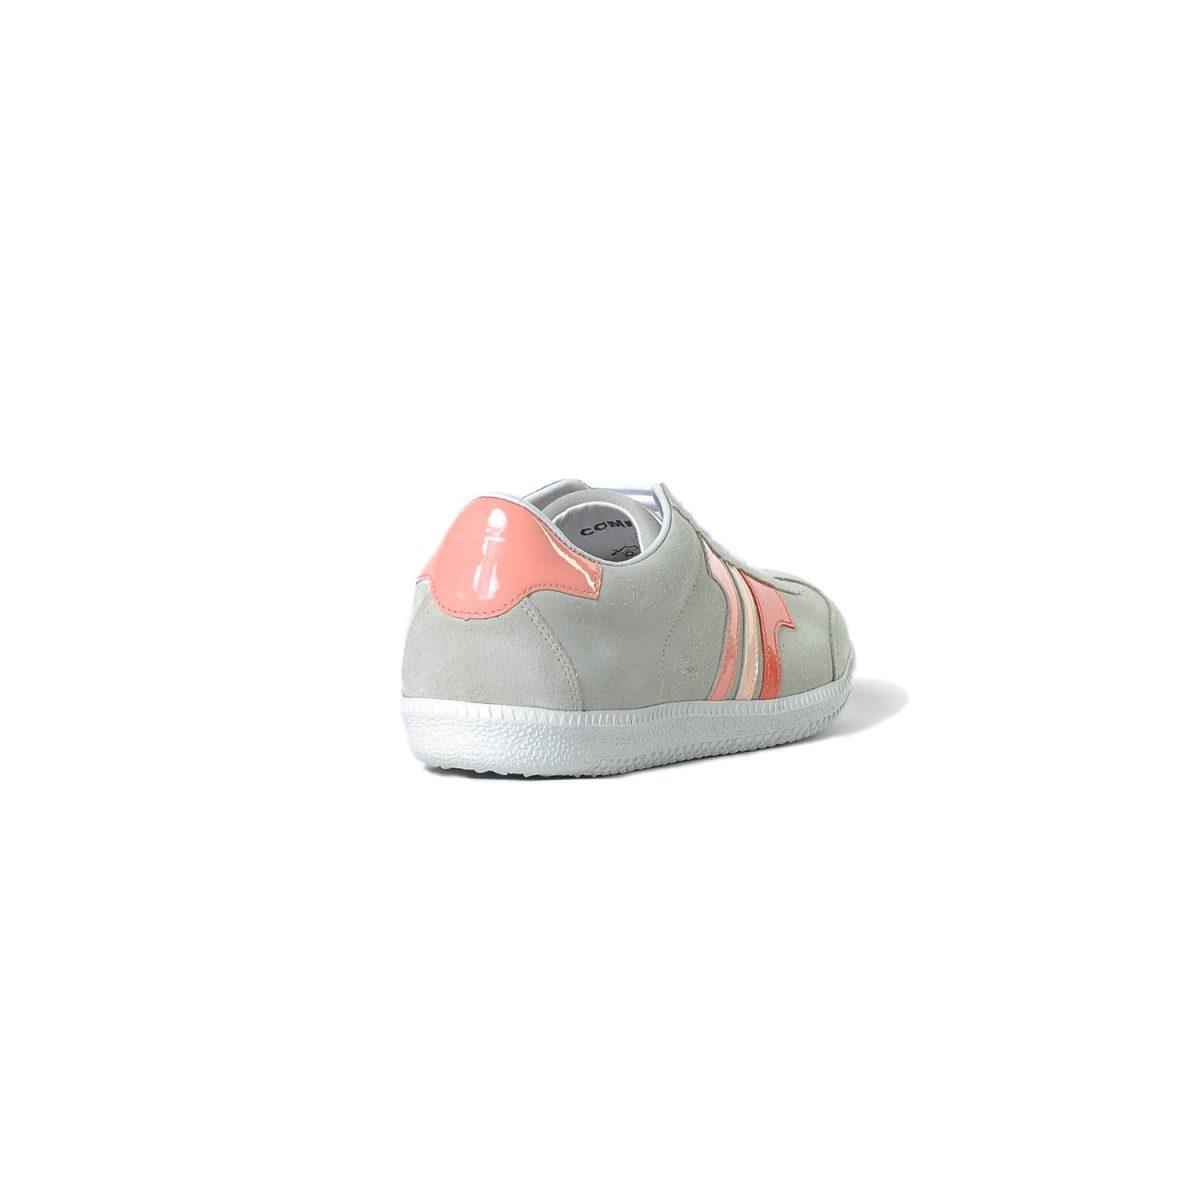 Tisza cipő - Comfort - Törtfehér-neon